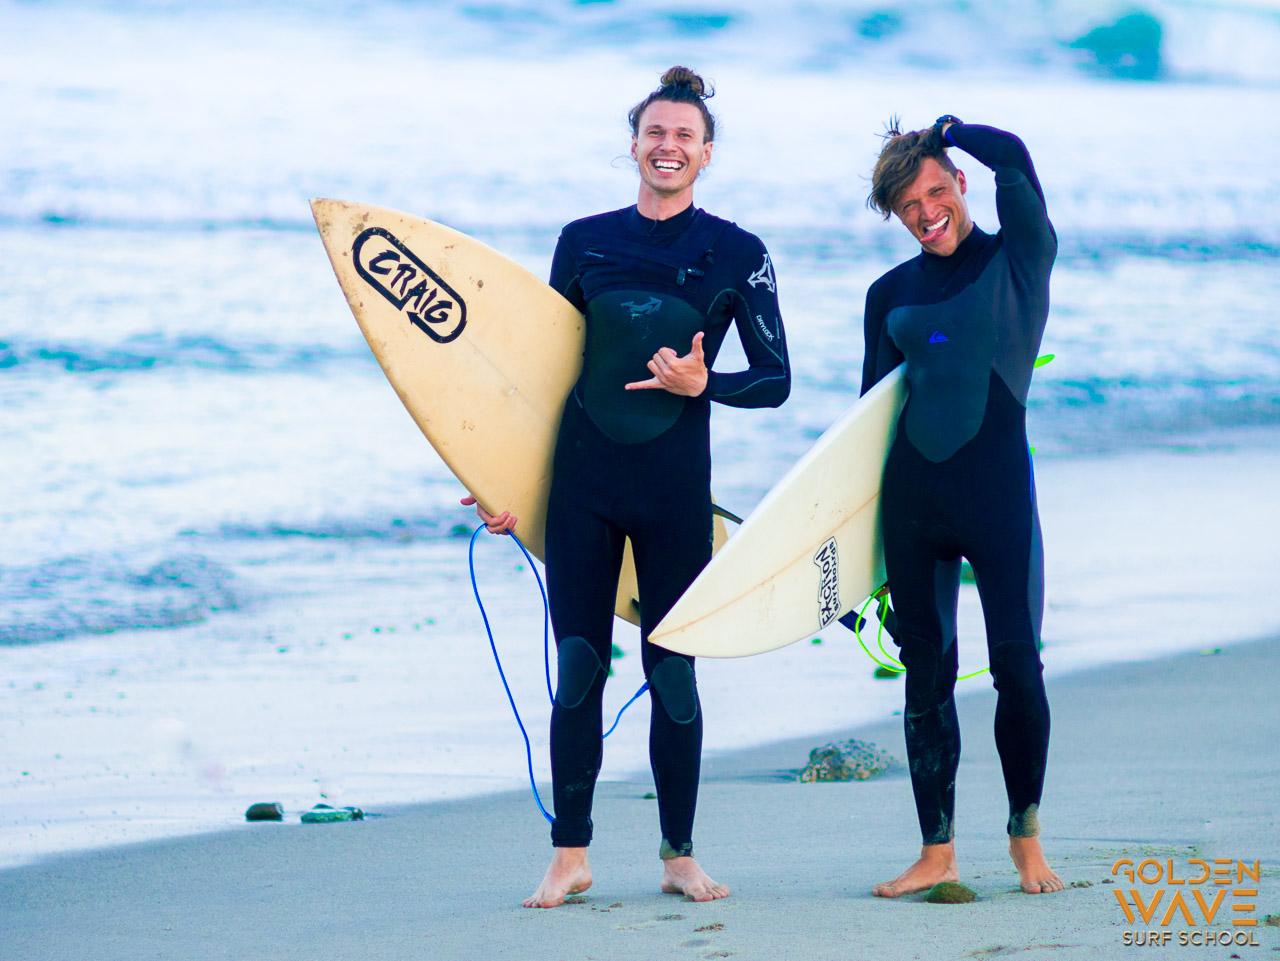 Golden Wave surf school, surf lesson, beginner surfer, surf student, surf school in LA, California, Malibu, Venice surfing lessons, Surfboard & wetsuits rentals, surf instructor